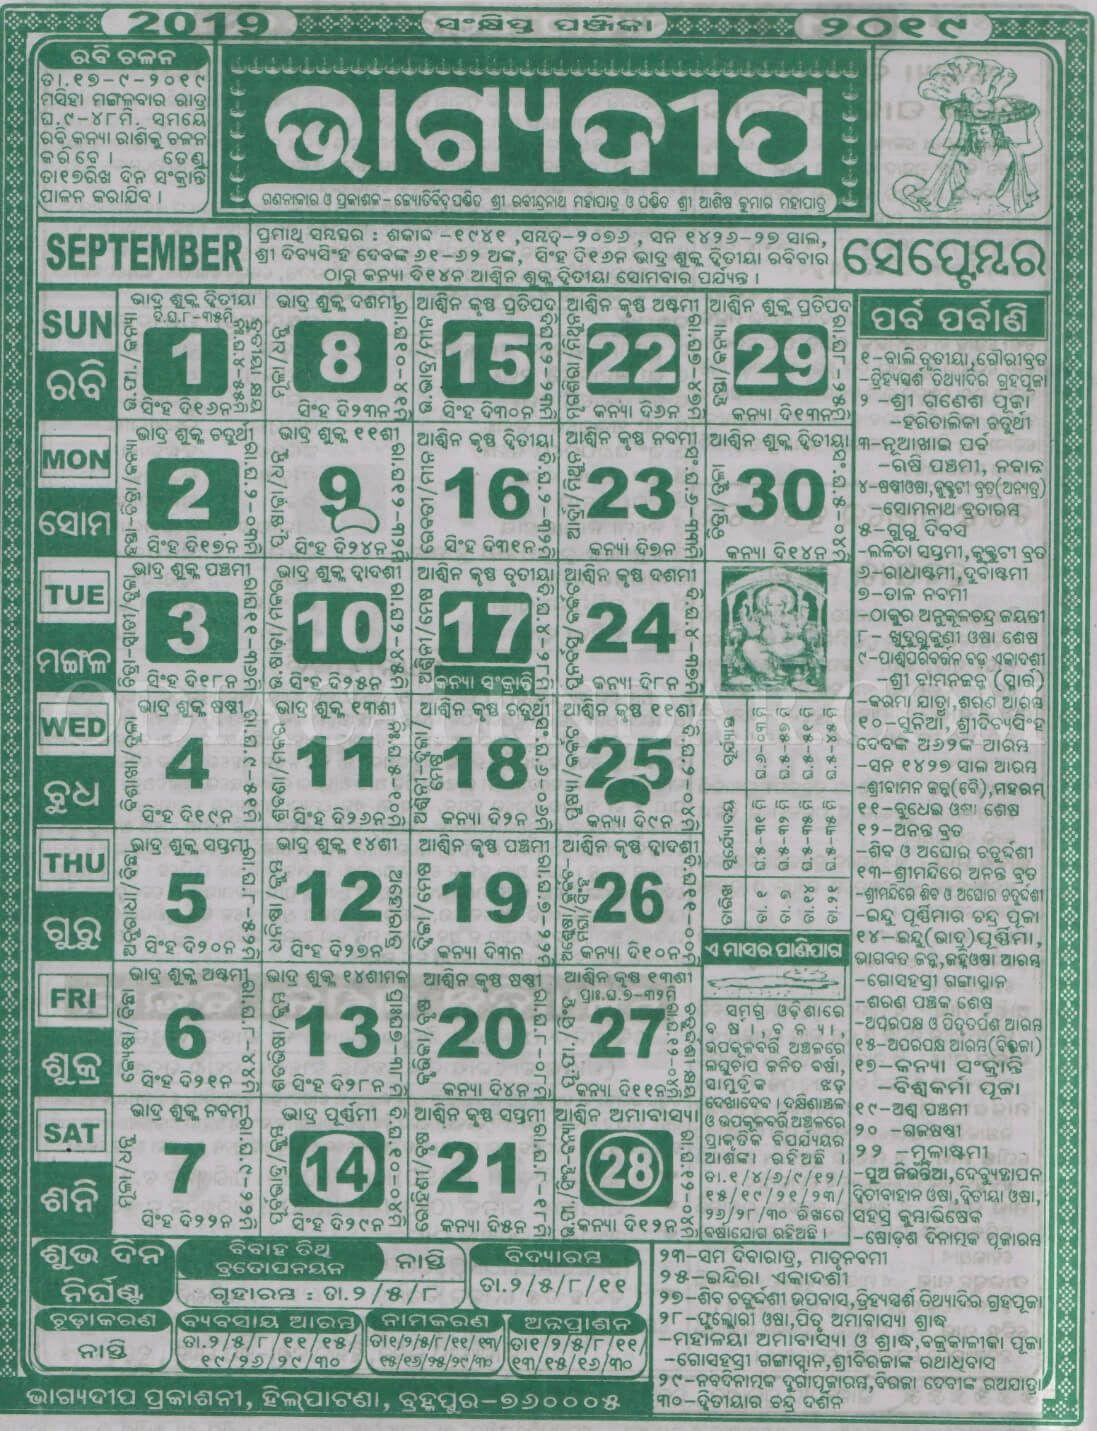 Bhagyadeep Calendar September 2019 | Calendar, App, December regarding Bhagyadipa Odia Calendar 2020